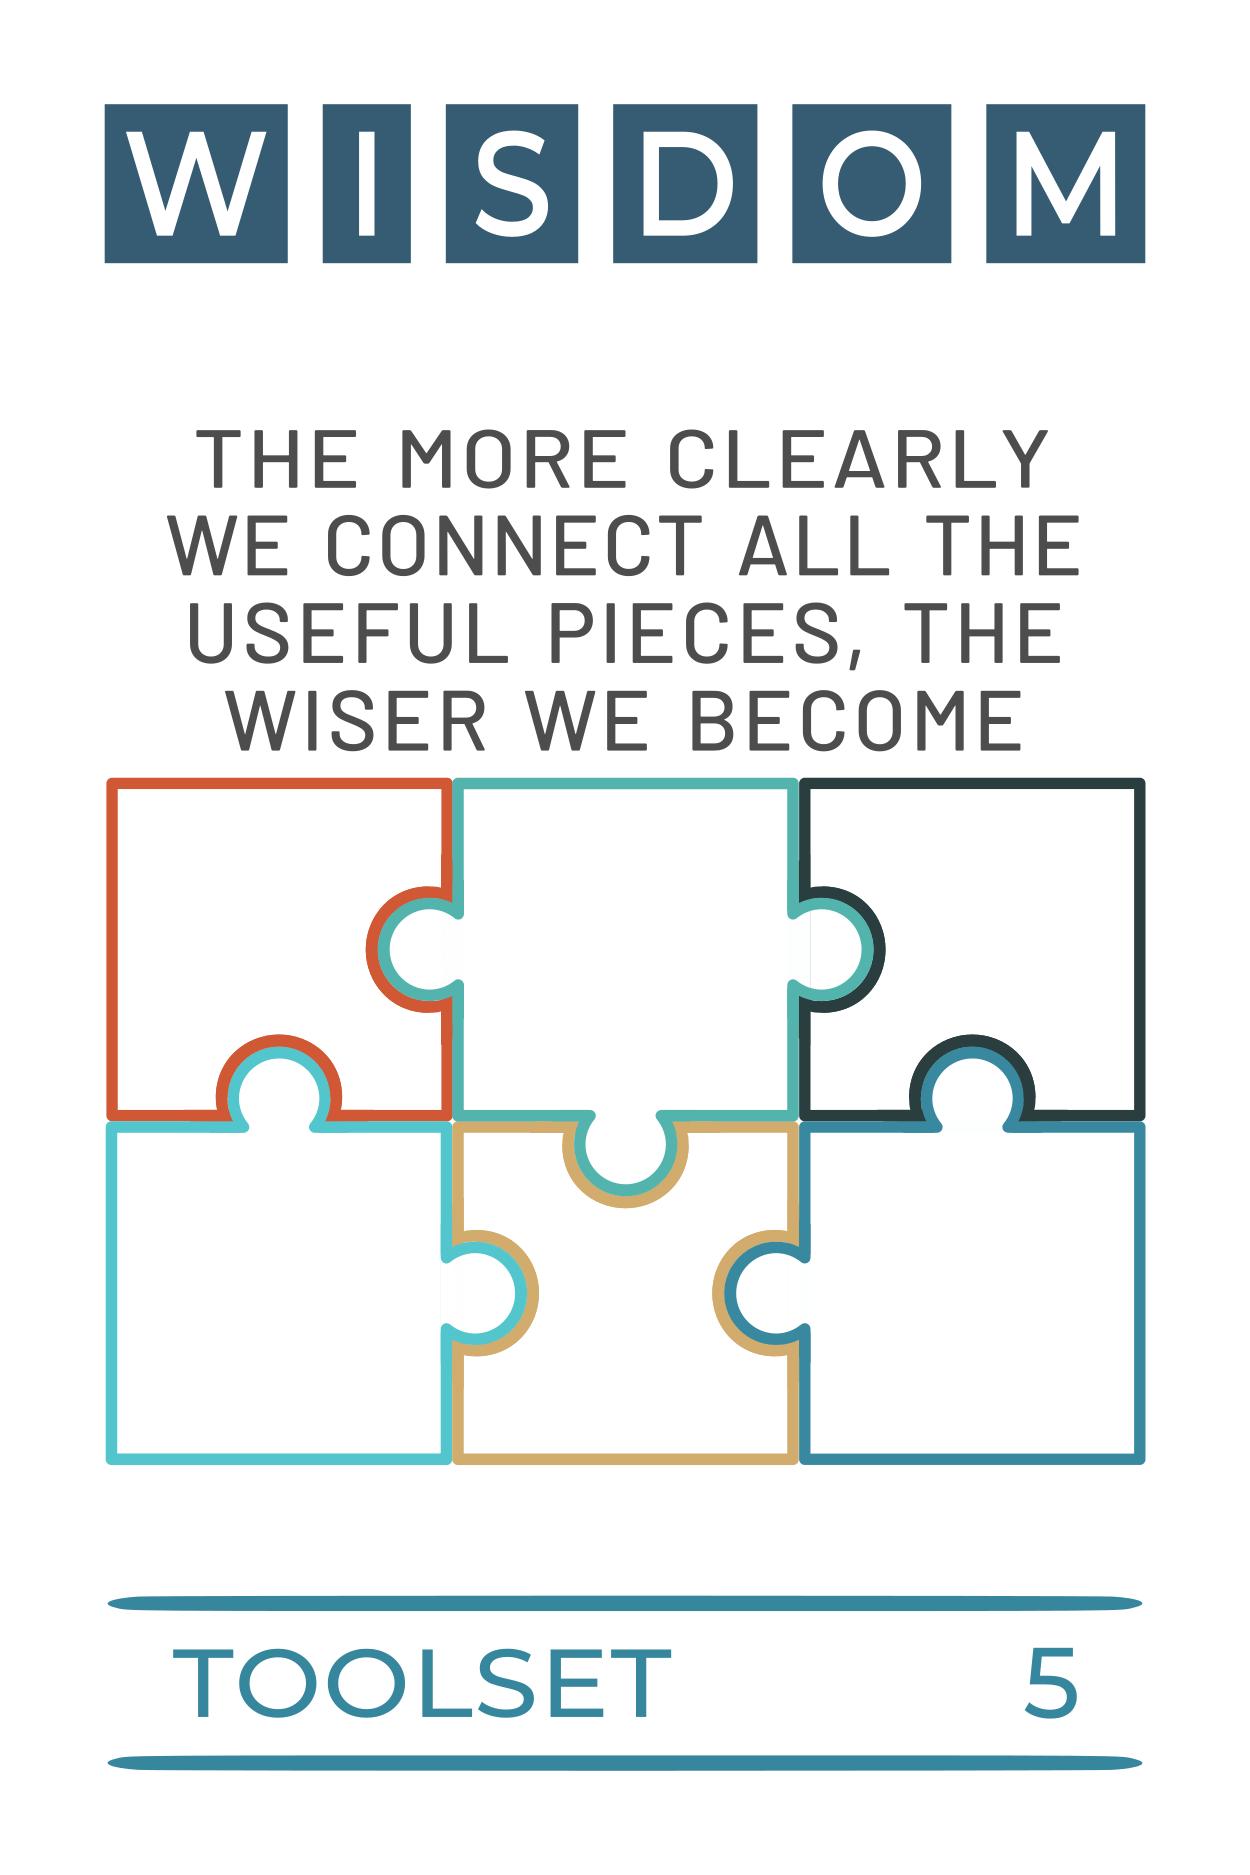 wisdom toolset